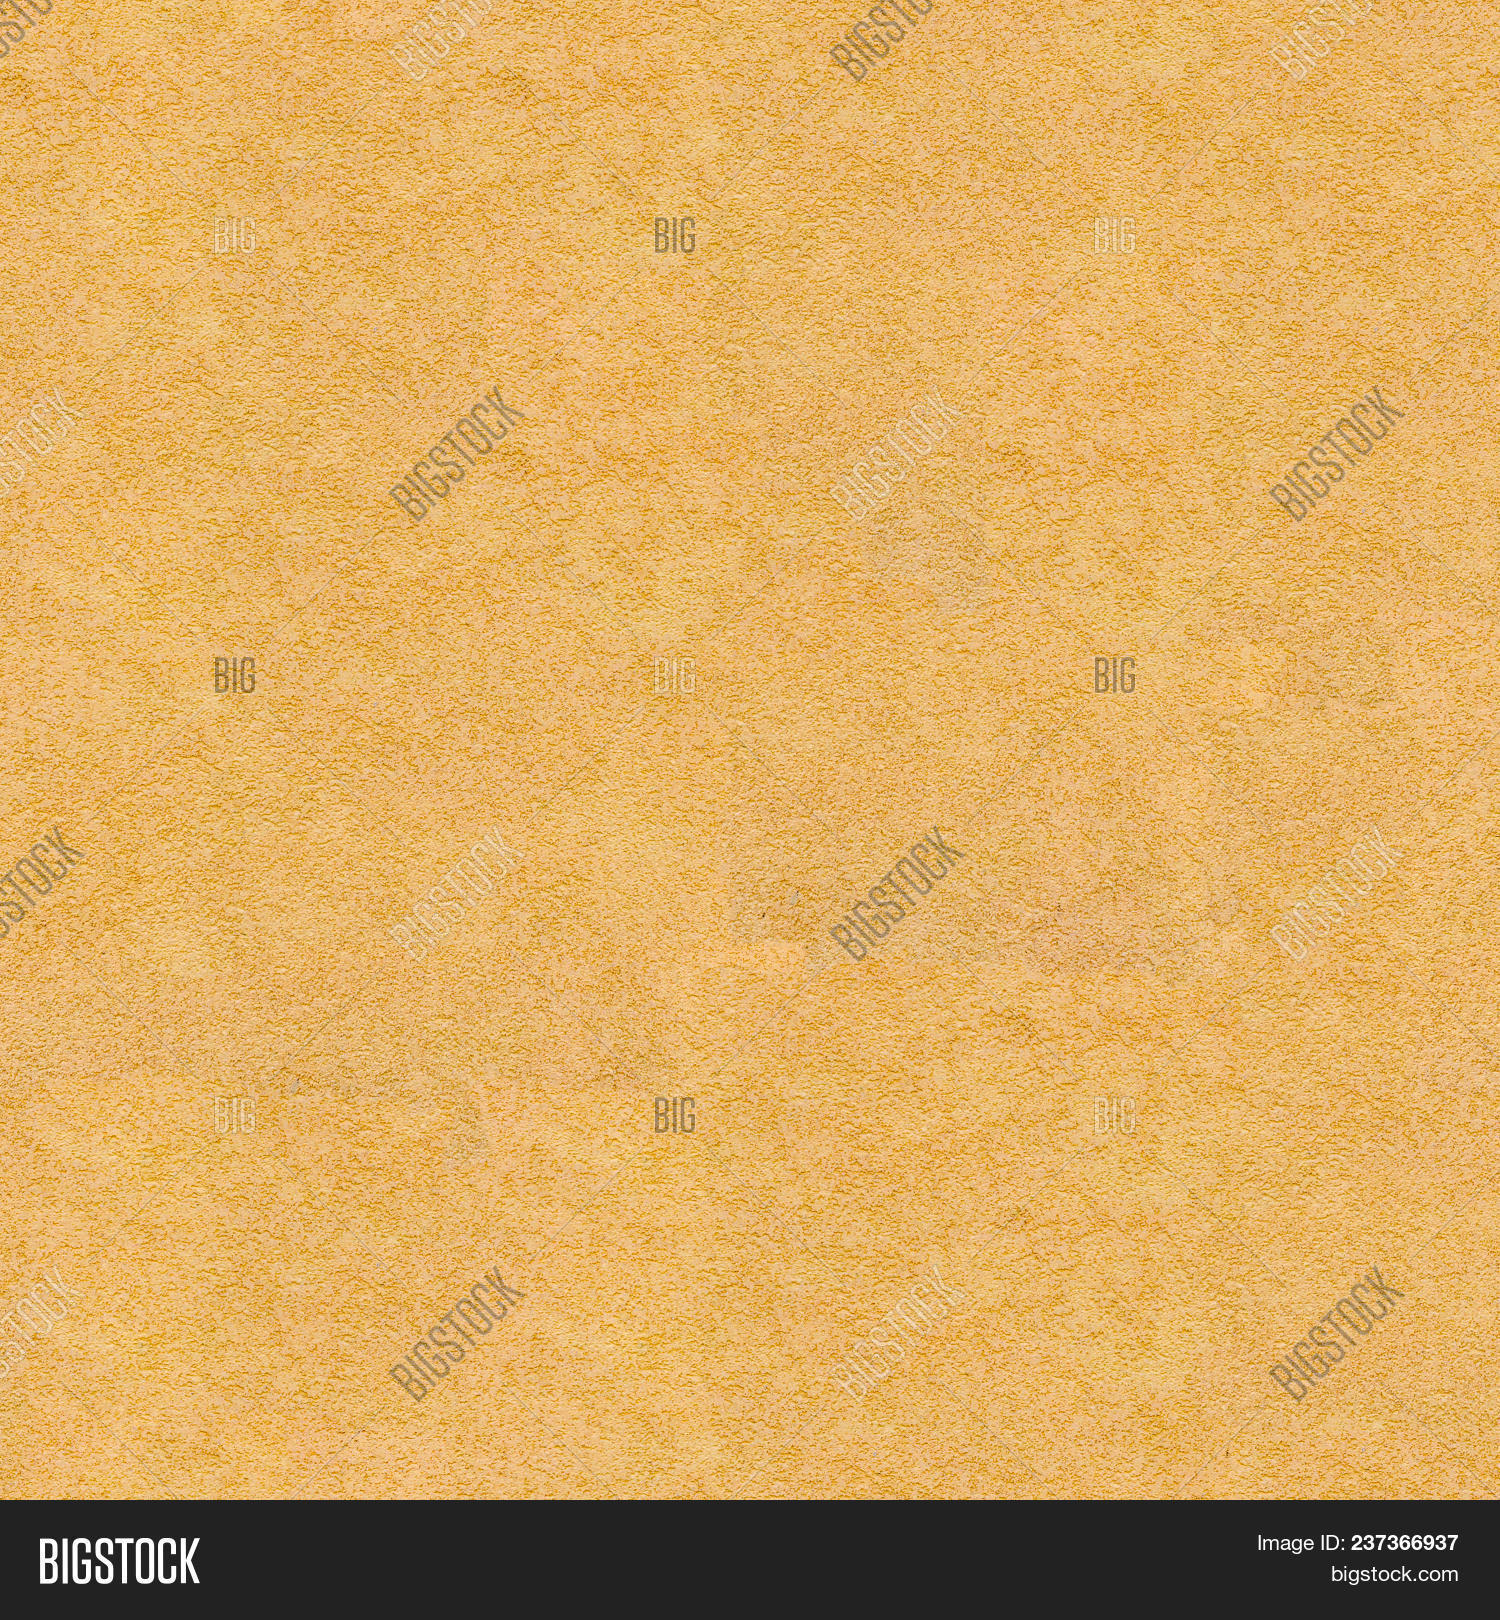 Wall Made Dark Yellow Image & Photo (Free Trial) | Bigstock